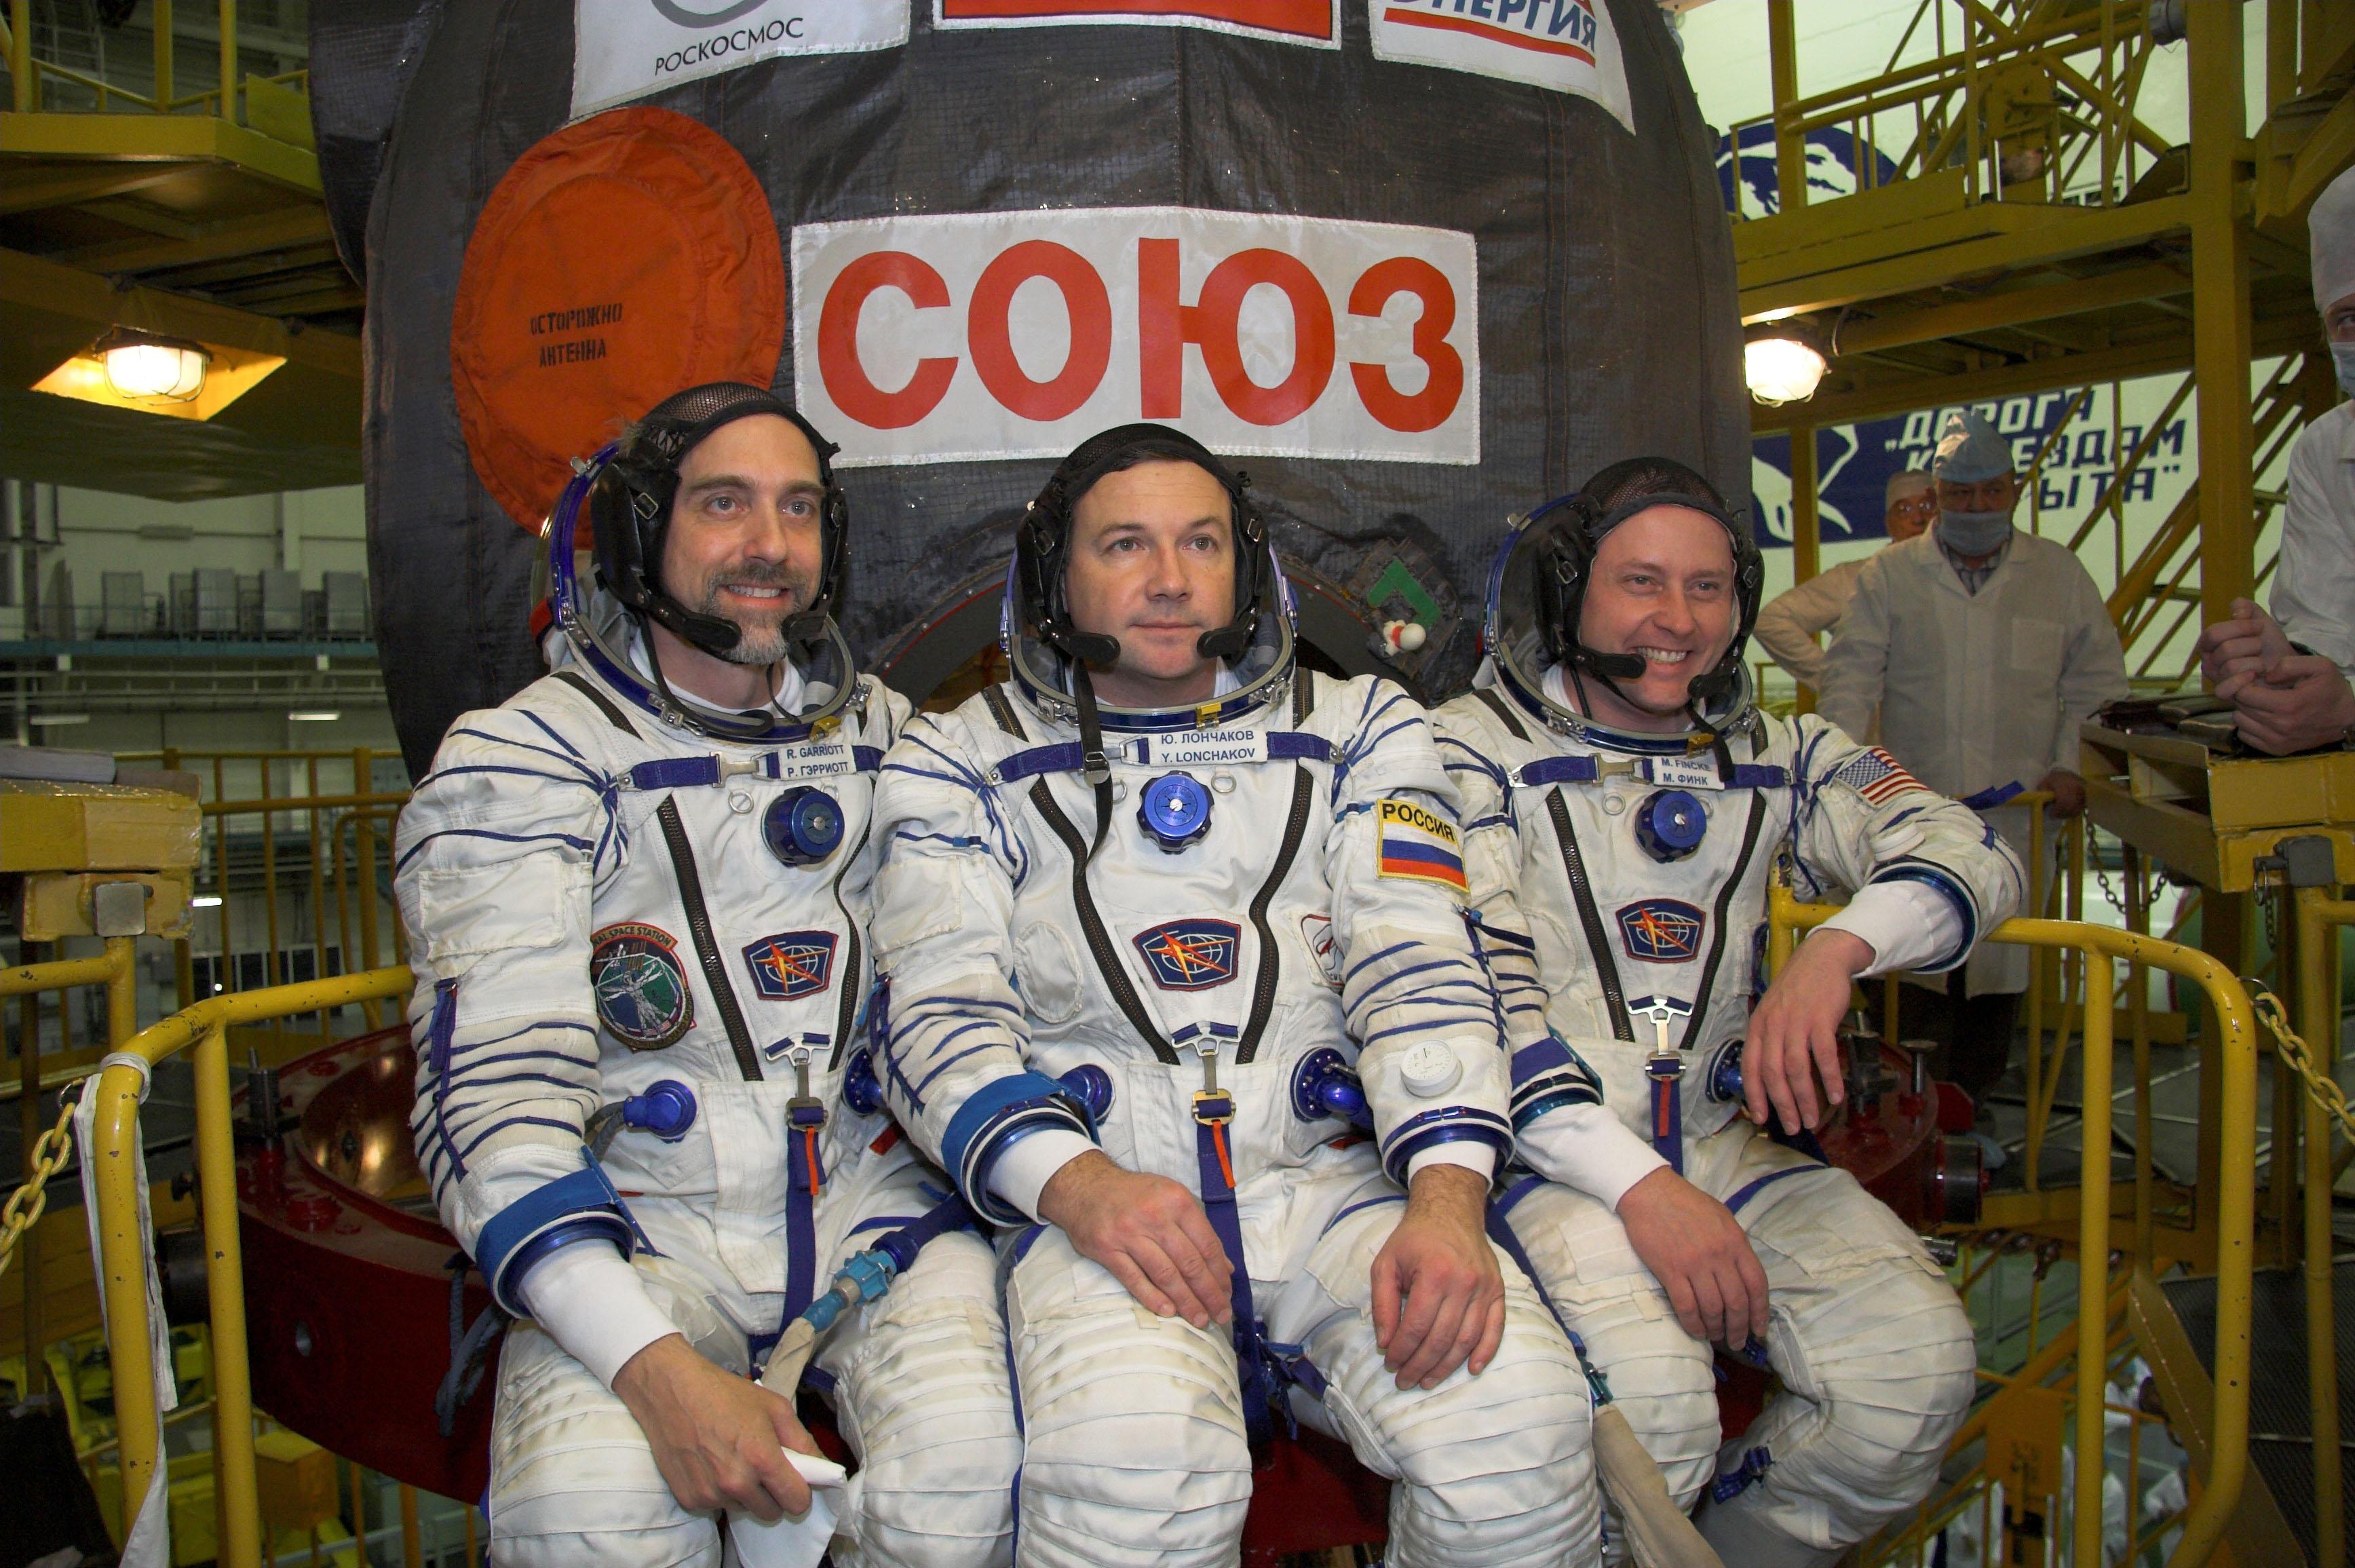 Richard Garriott, Yury Lonchakov and Michael Fincke of Expedition 18